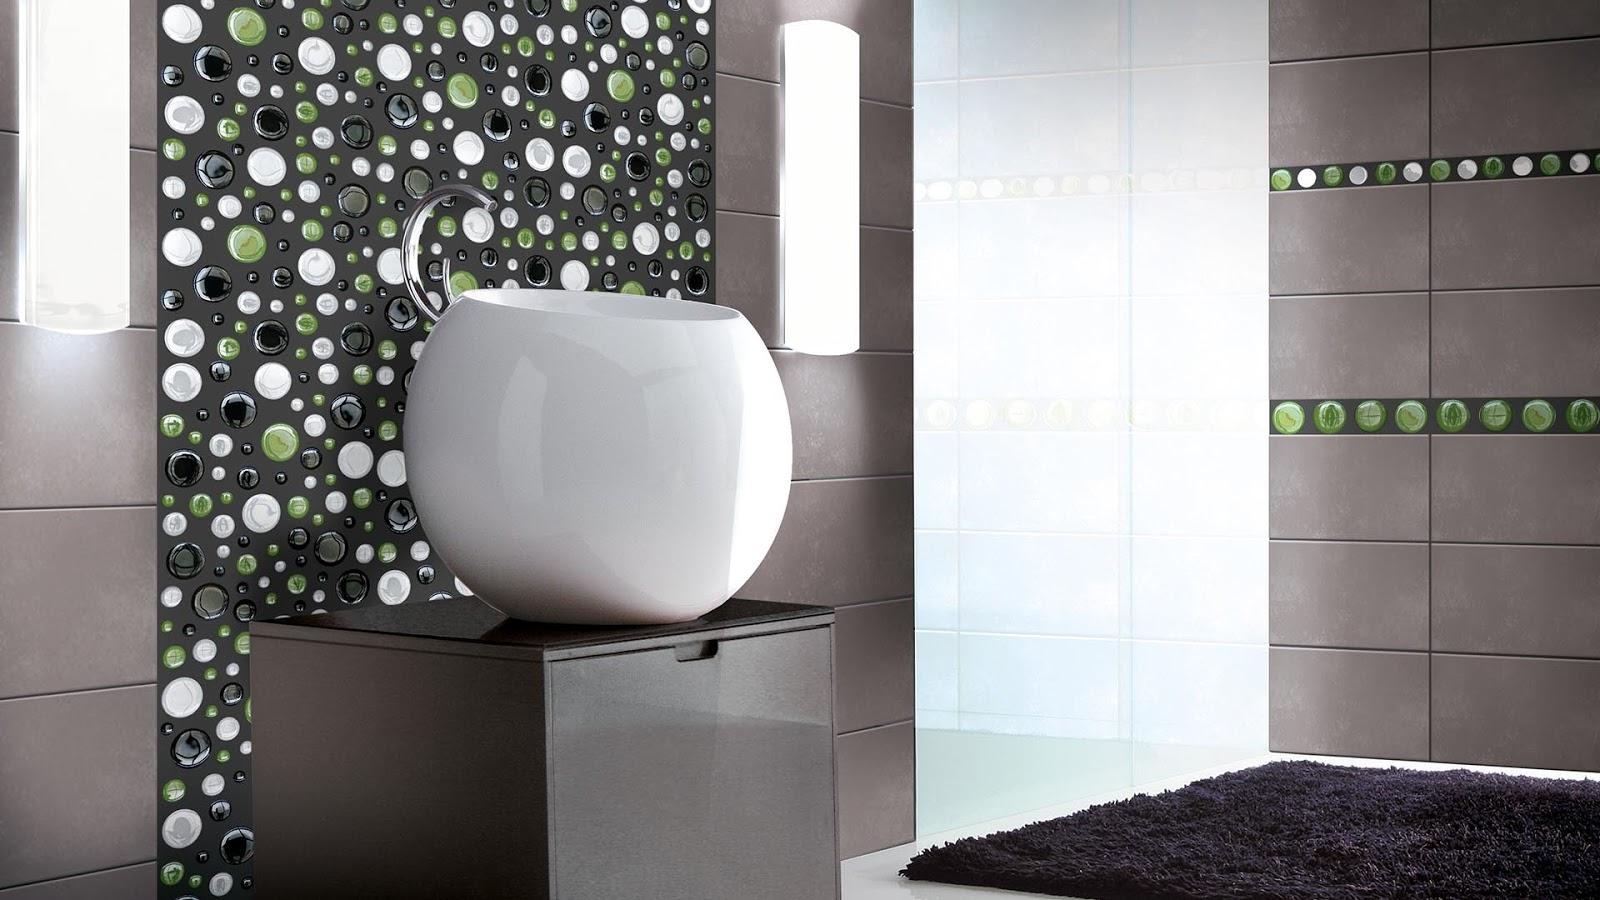 Mosaic tiles in bathroom from Vetrovivo | Floor & Wall Tiles Design ...